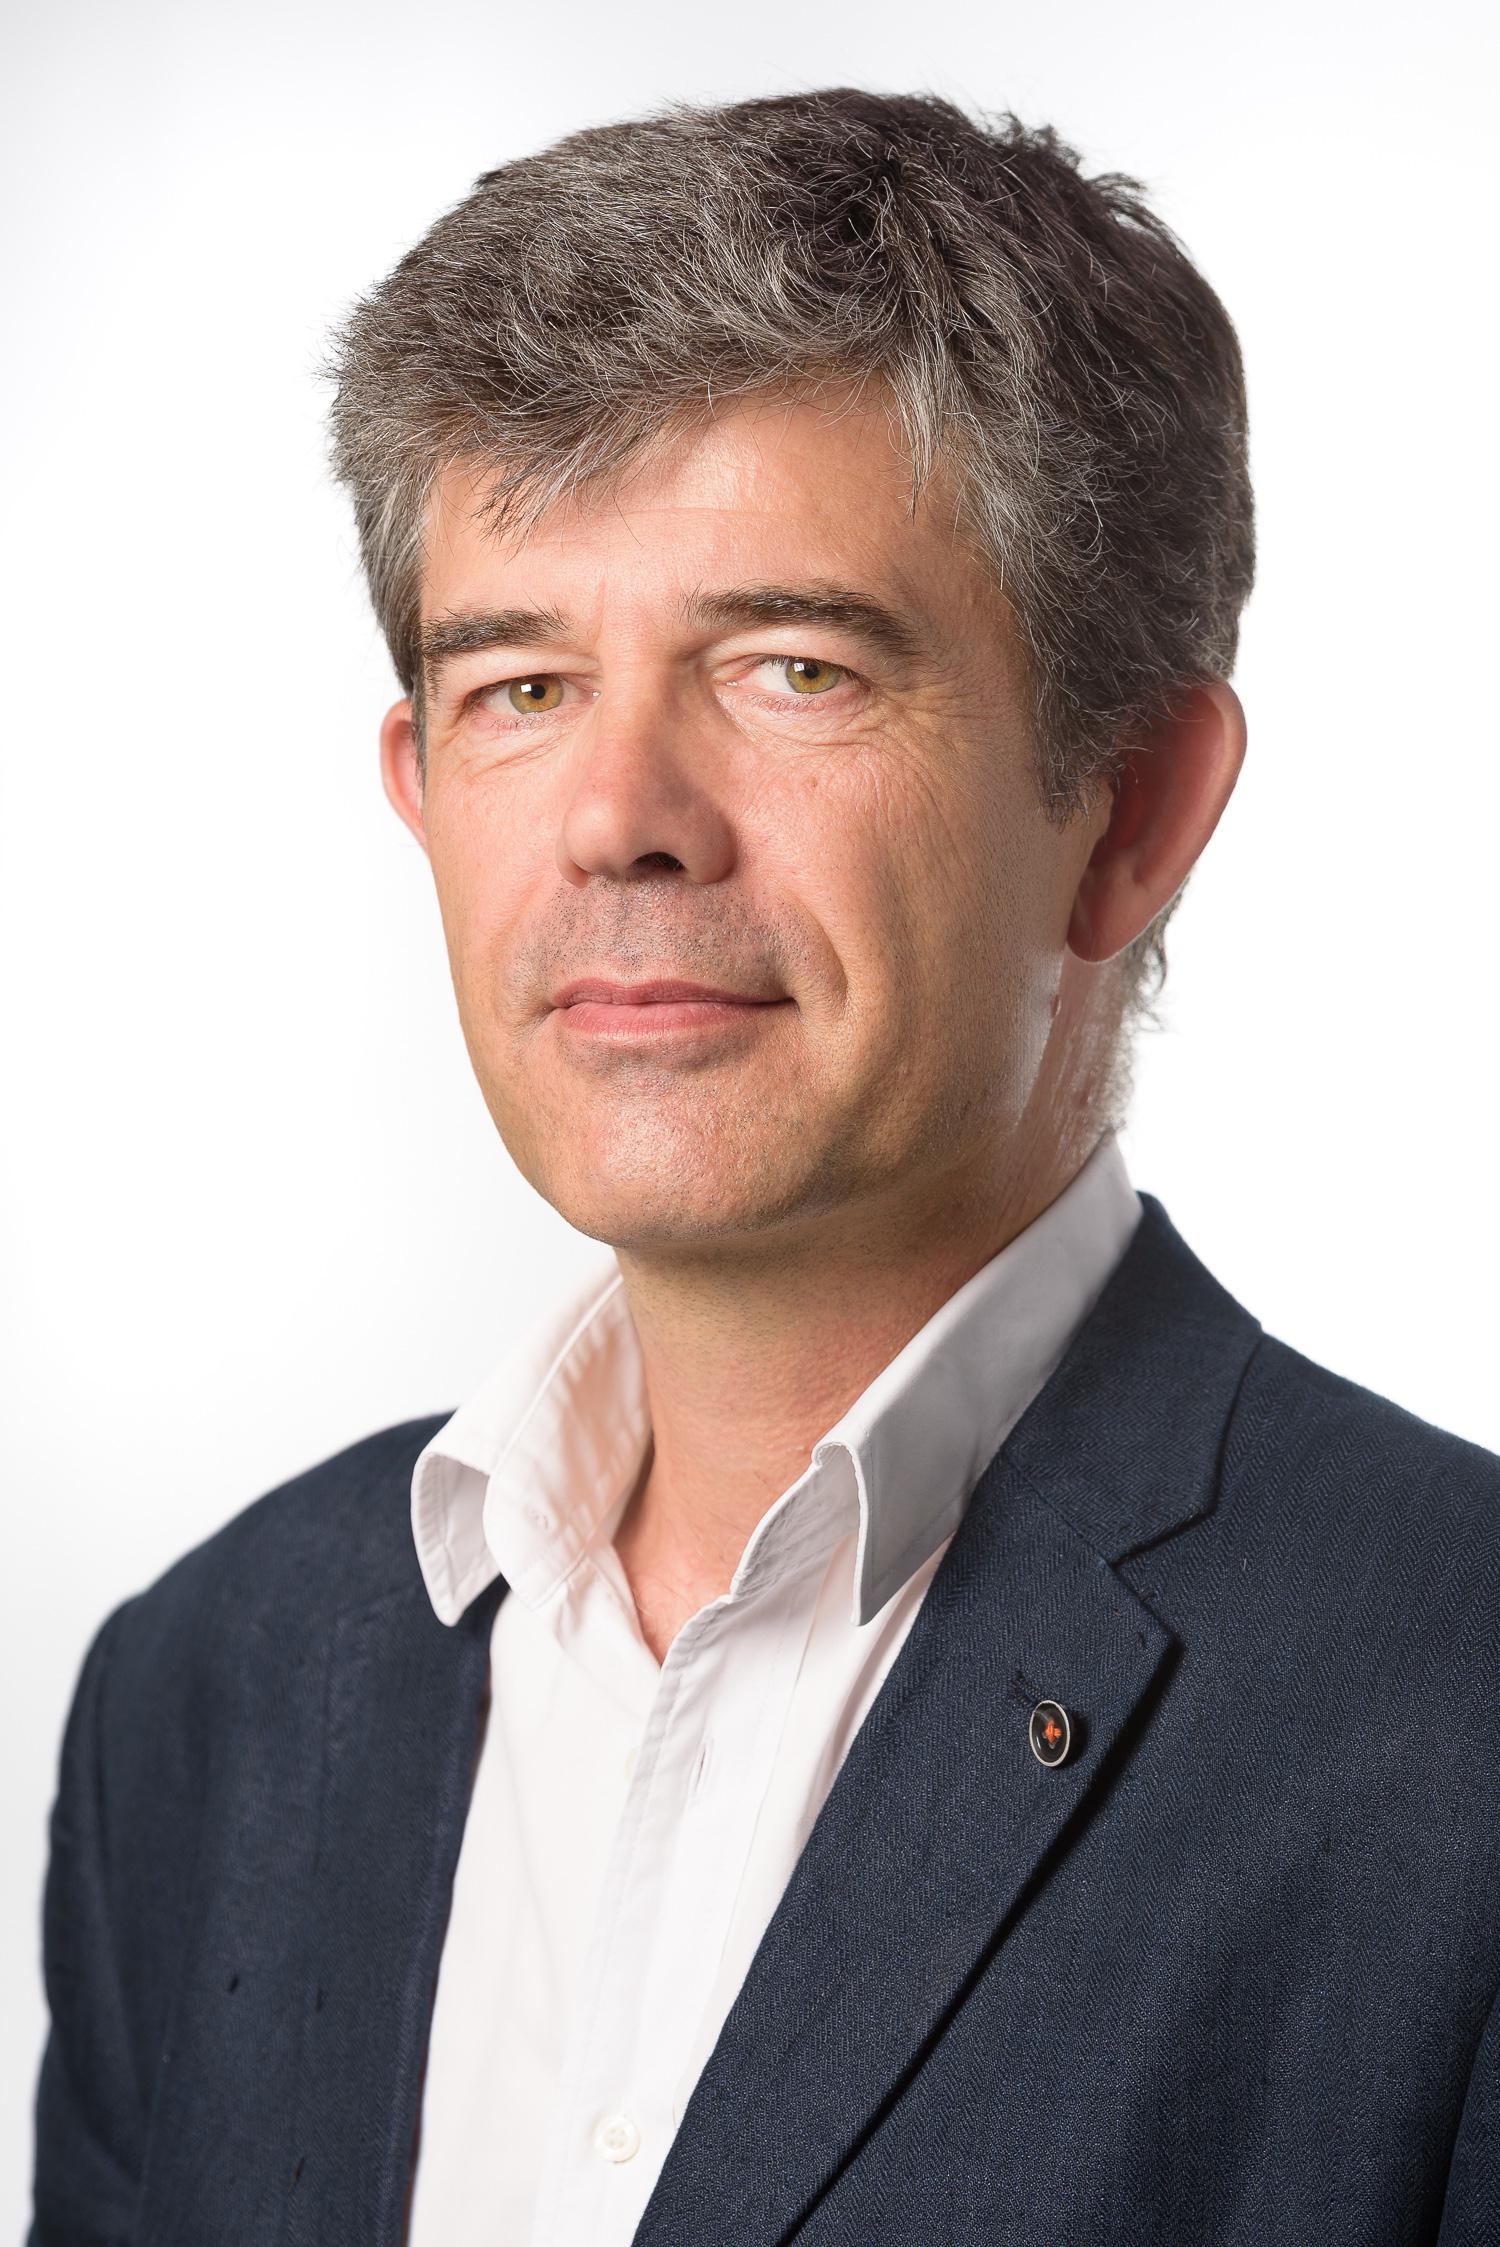 Alain ASQUIN, Université Jean Moulin Lyon 3